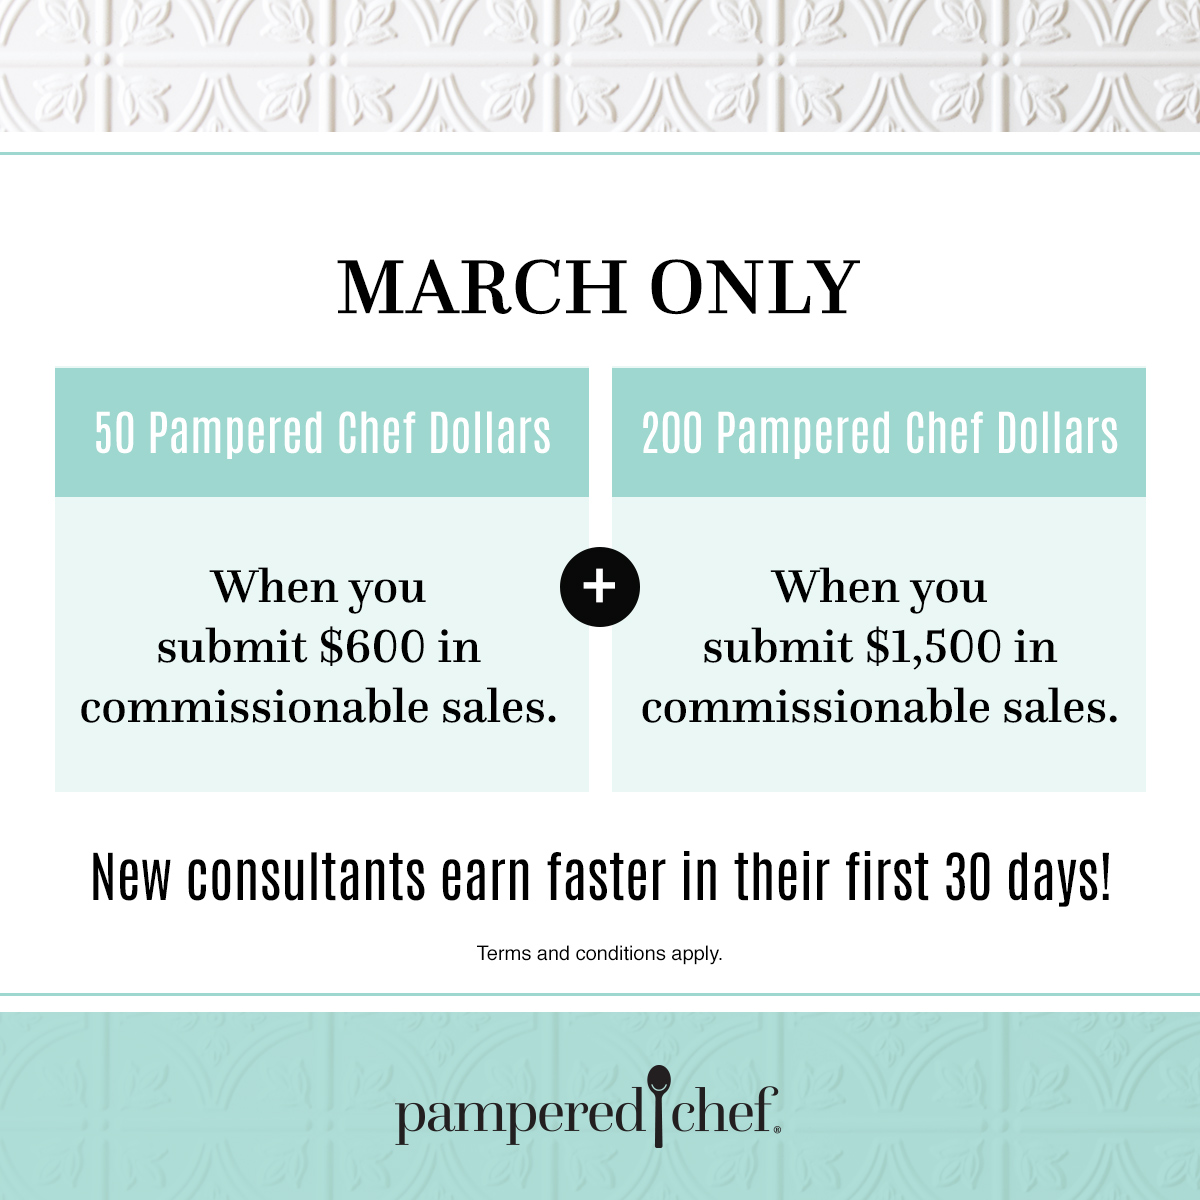 post-sales-promotion-mar2019-02-ca.jpg